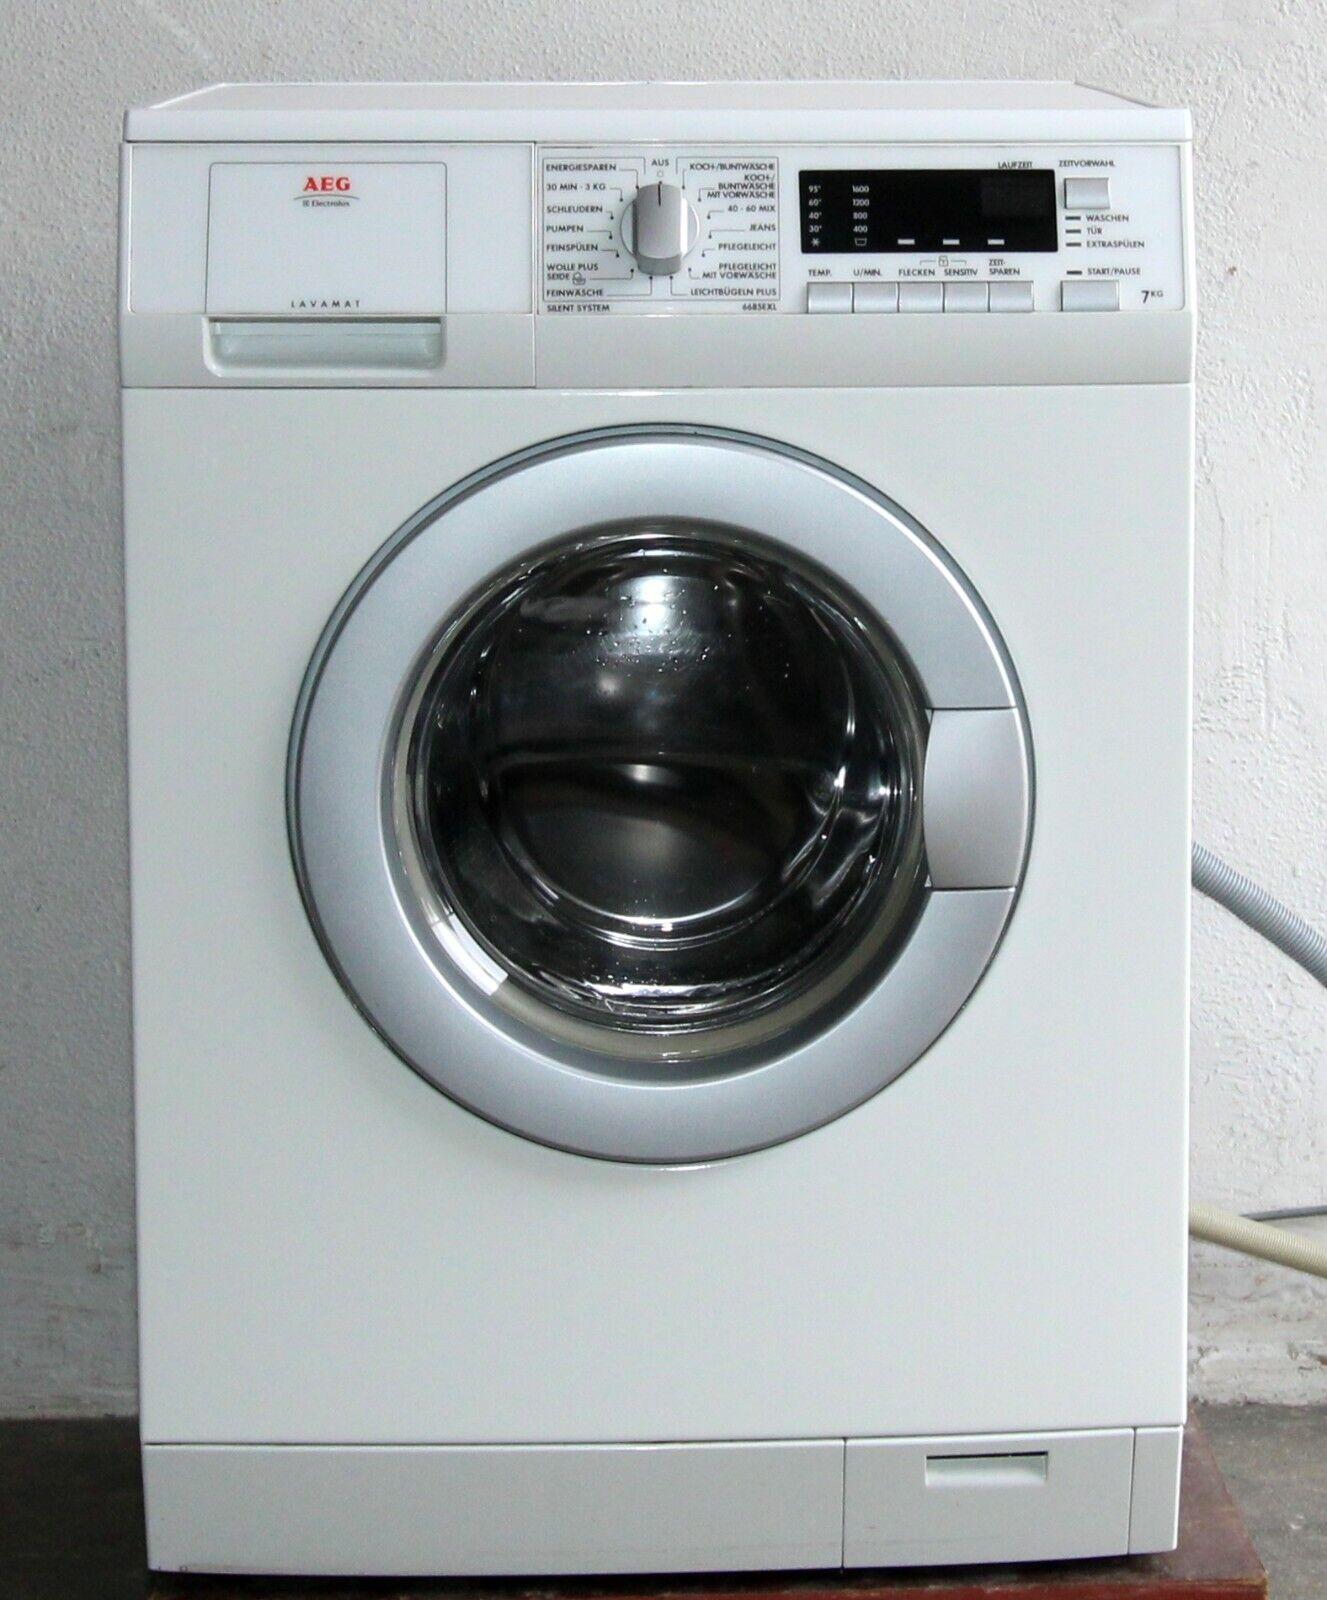 AEG Lavamat Waschmaschine 7 kg, 1600 U/min, voll funktionstüchtig